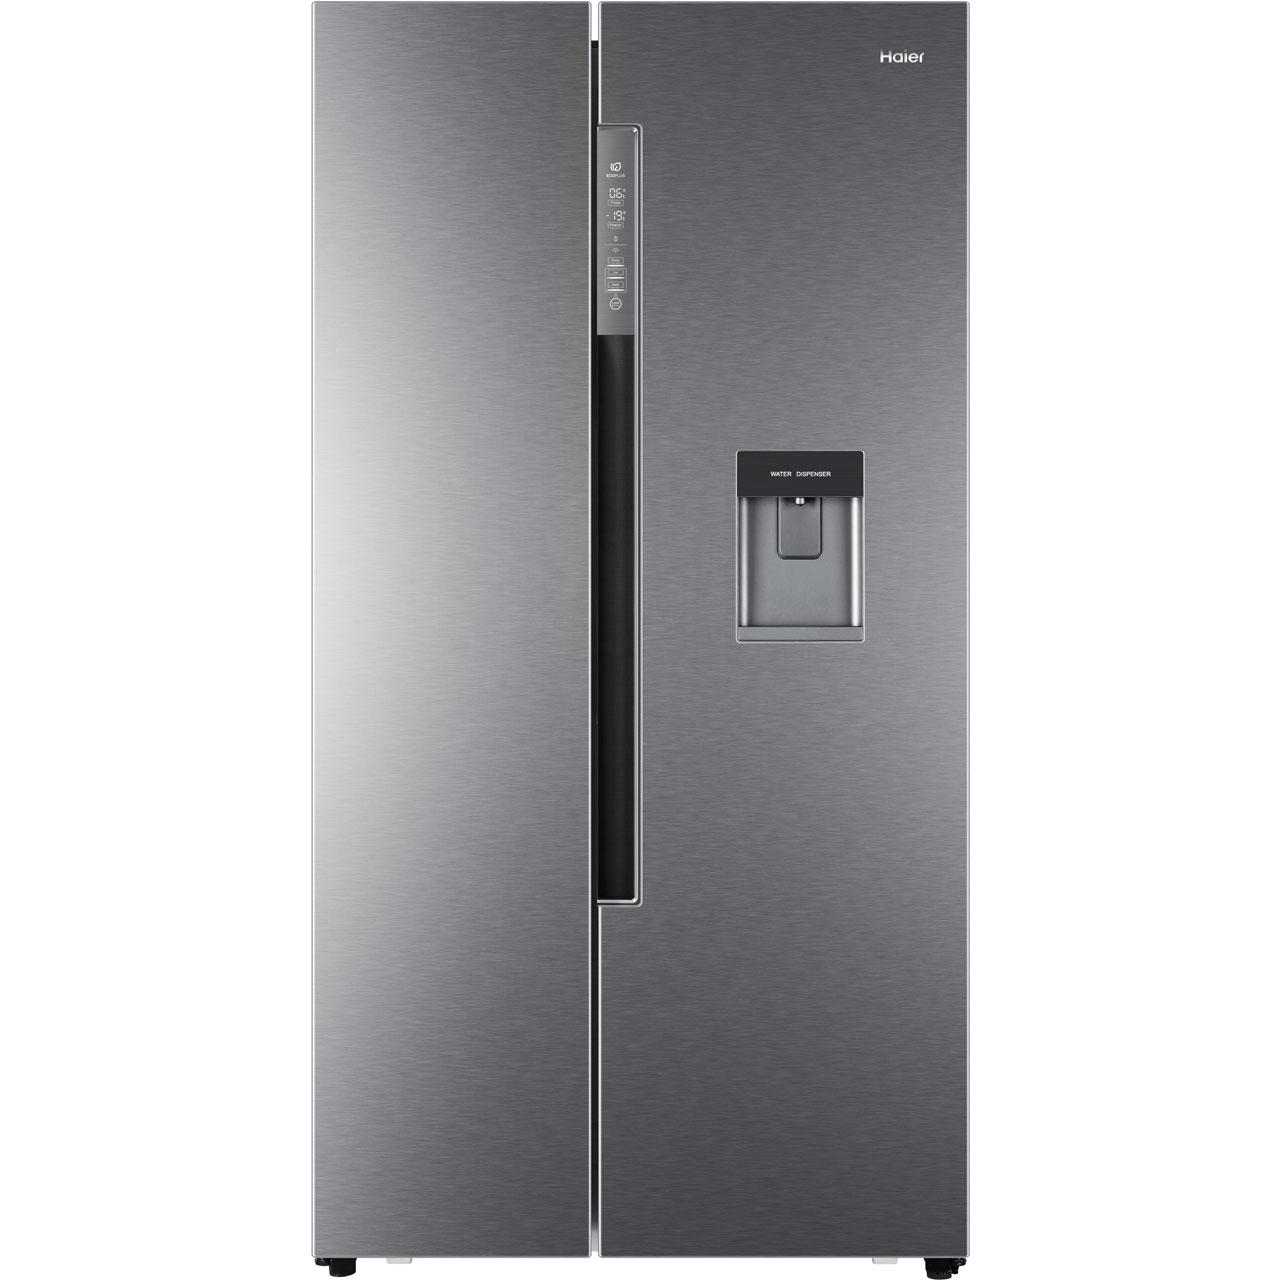 haier american fridge freezer. haier american fridge freezer o